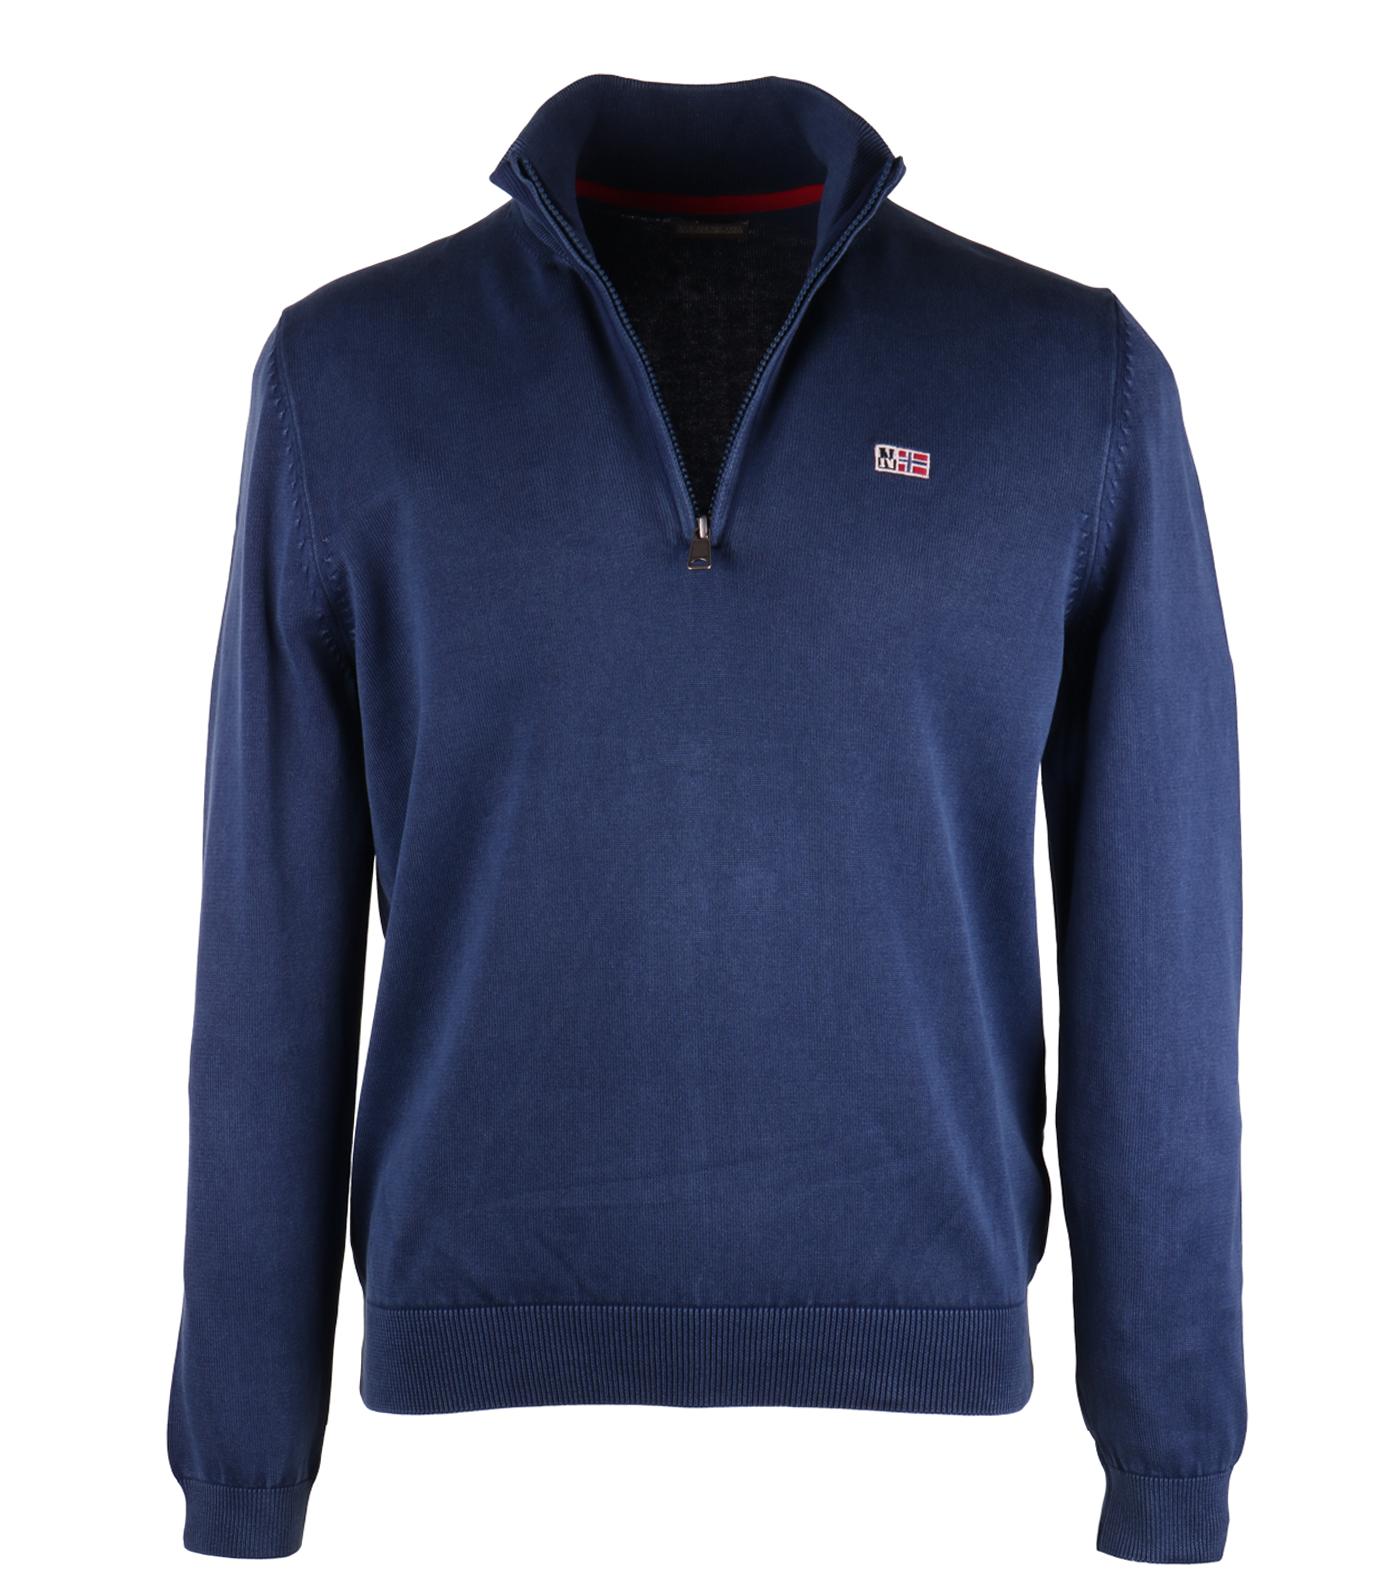 Napapijri pull zipper davesh indigo blauw for Designhotel maastricht comfort xl